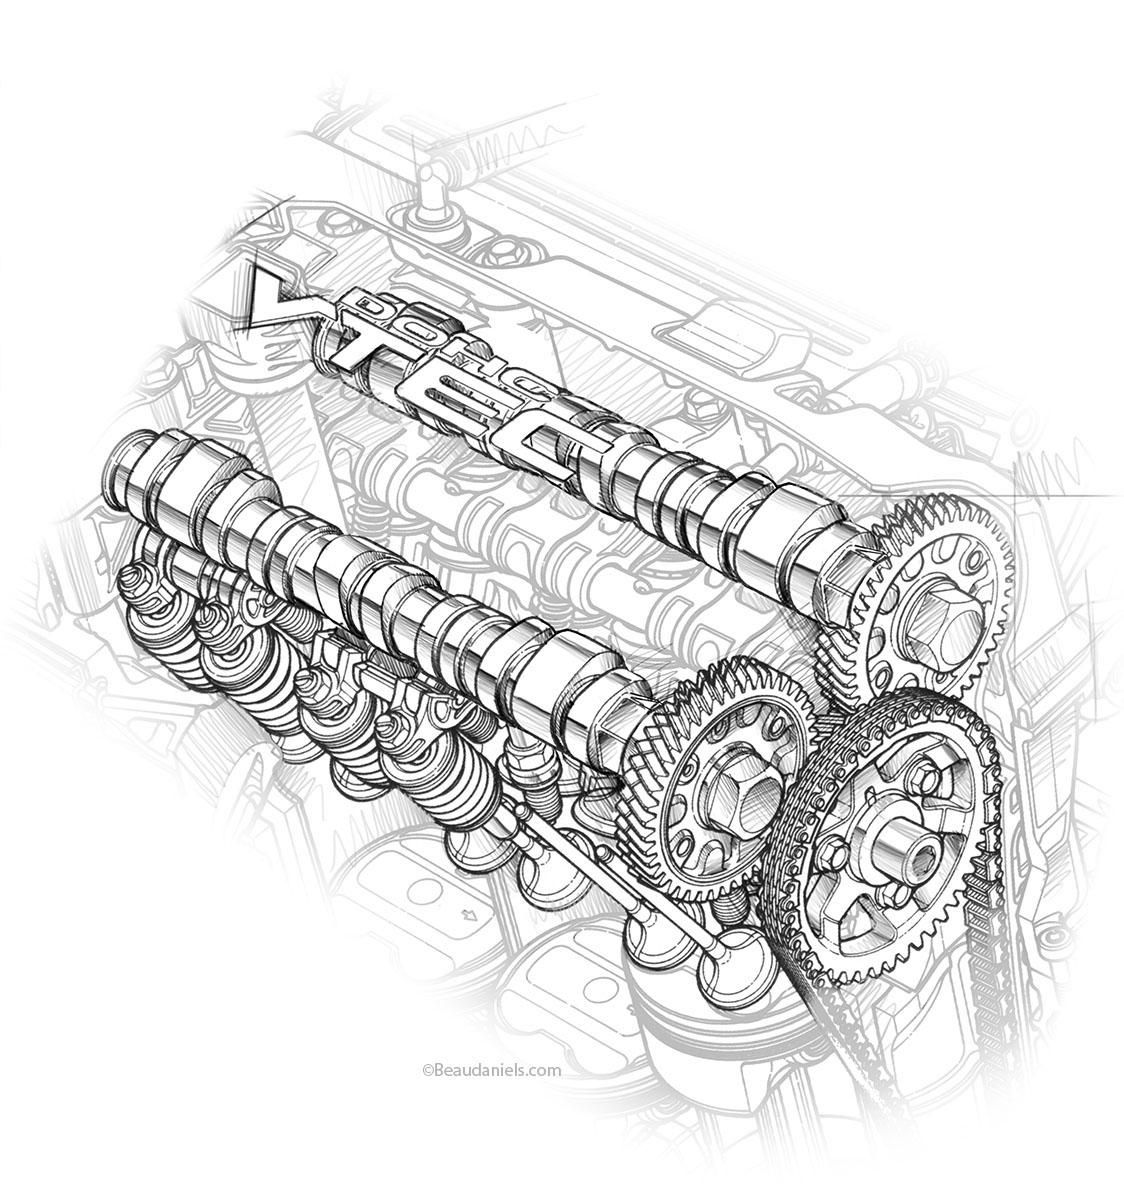 Generic Car Engines Portfolio 2 On Behance